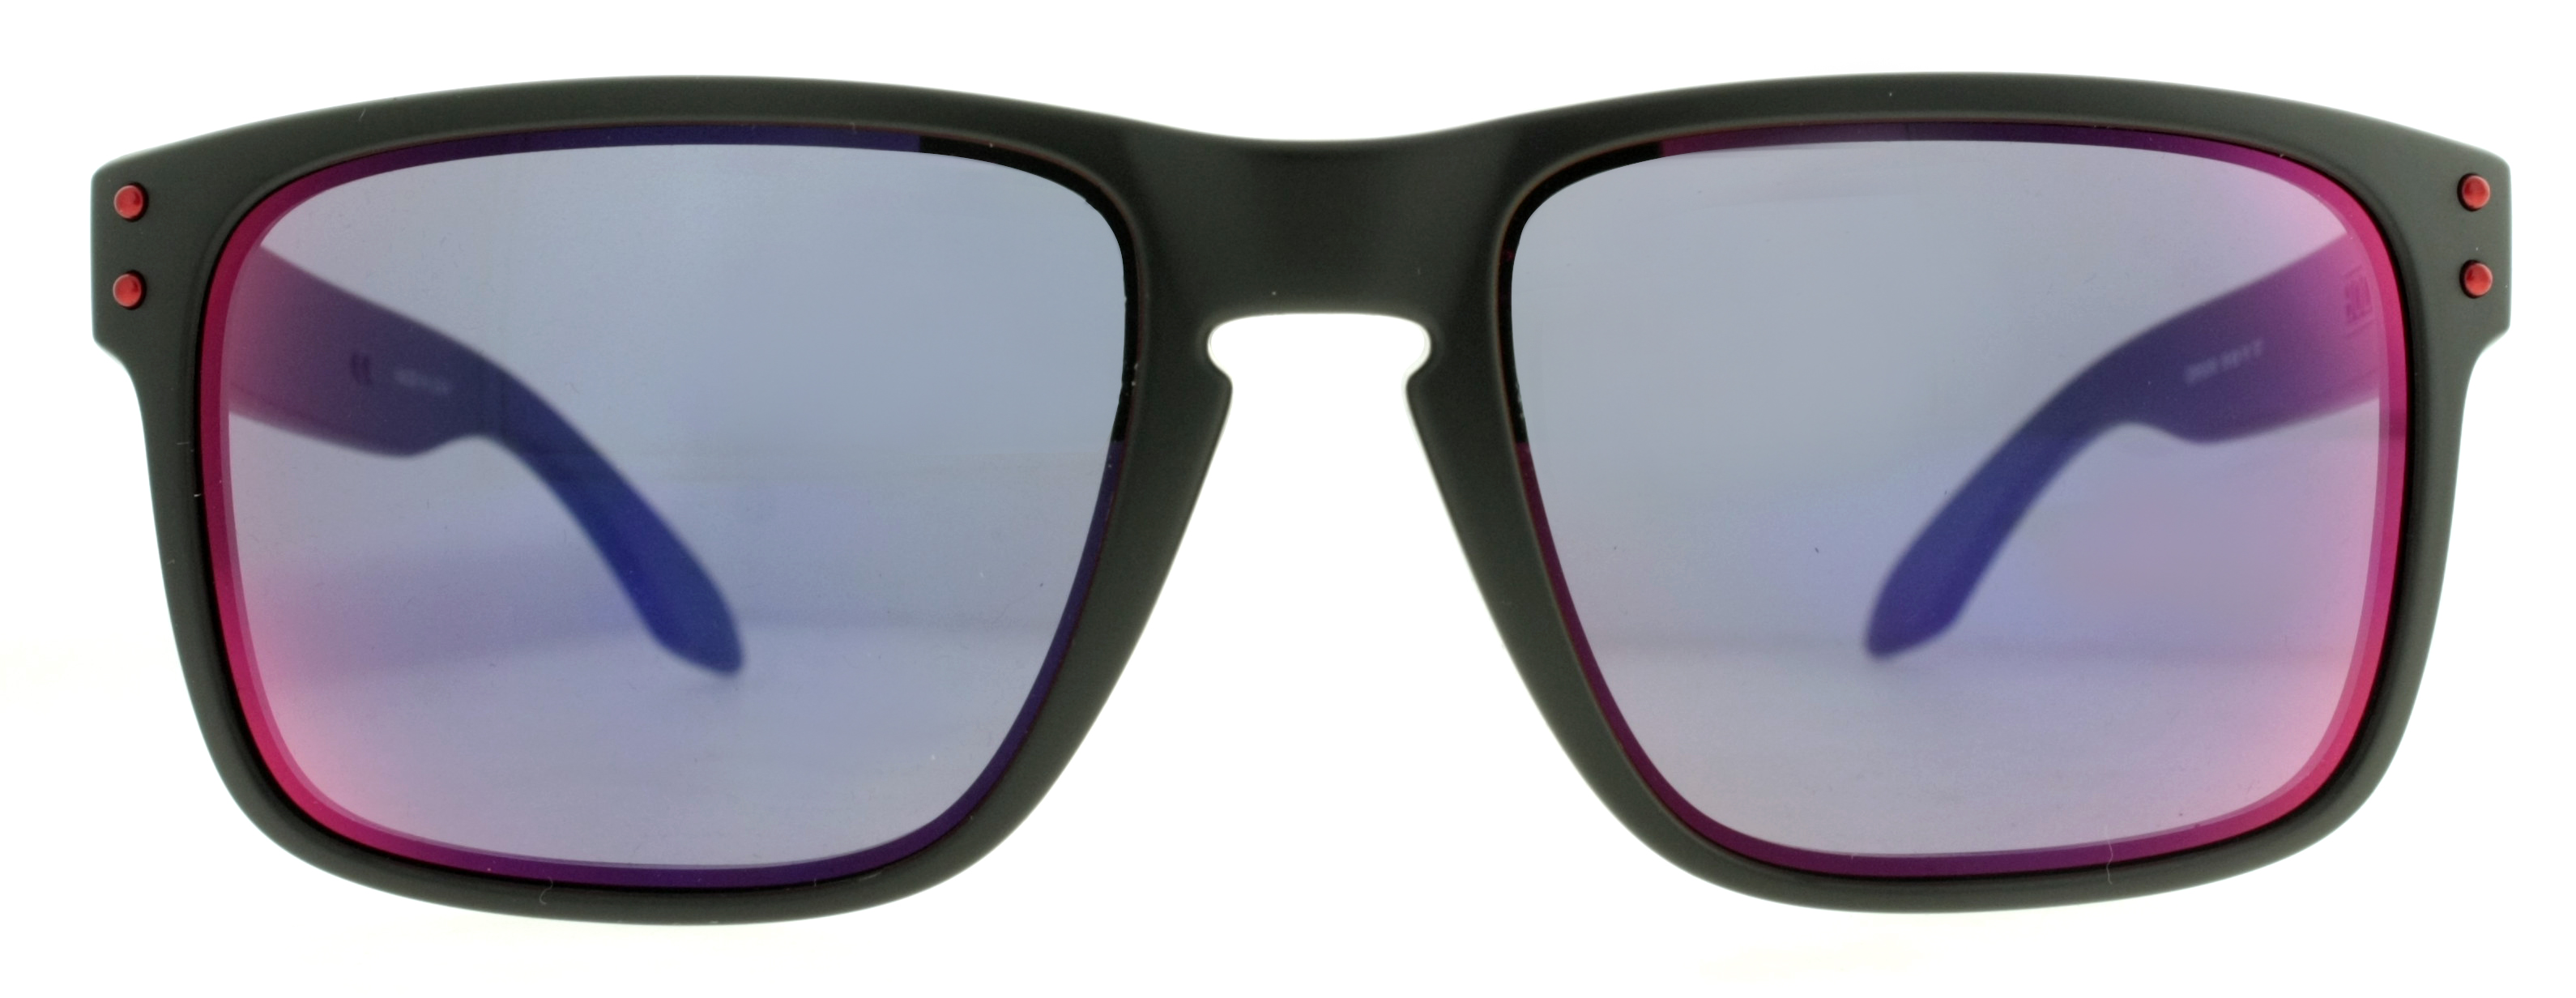 black and blue oakley sunglasses d1xw  Oakley Holbrook OO9102-36 Matte Black Blue Iridium Sunglasses 55mm